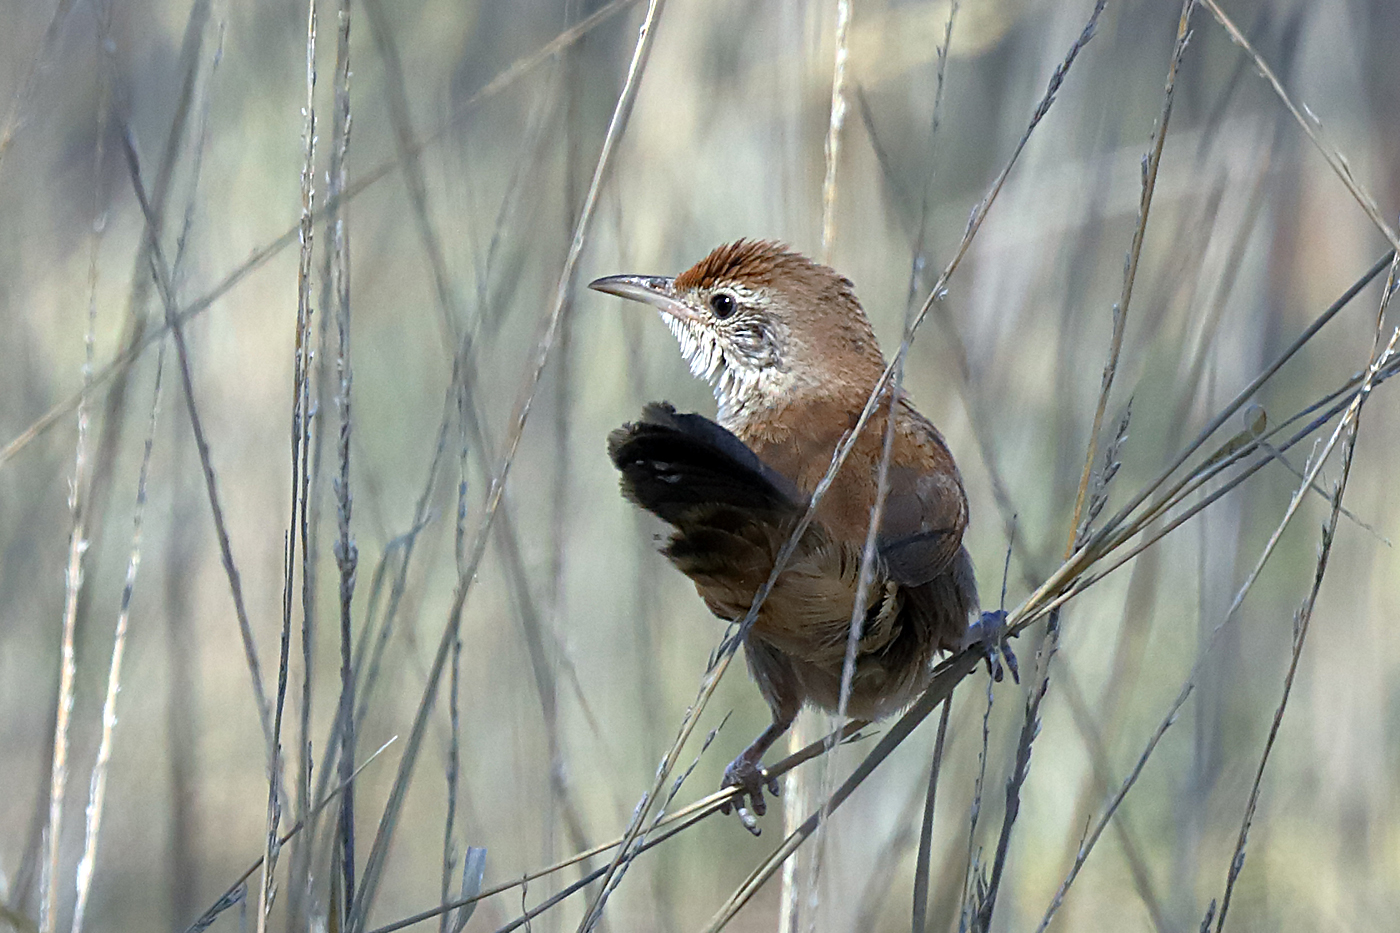 Spinifexbird